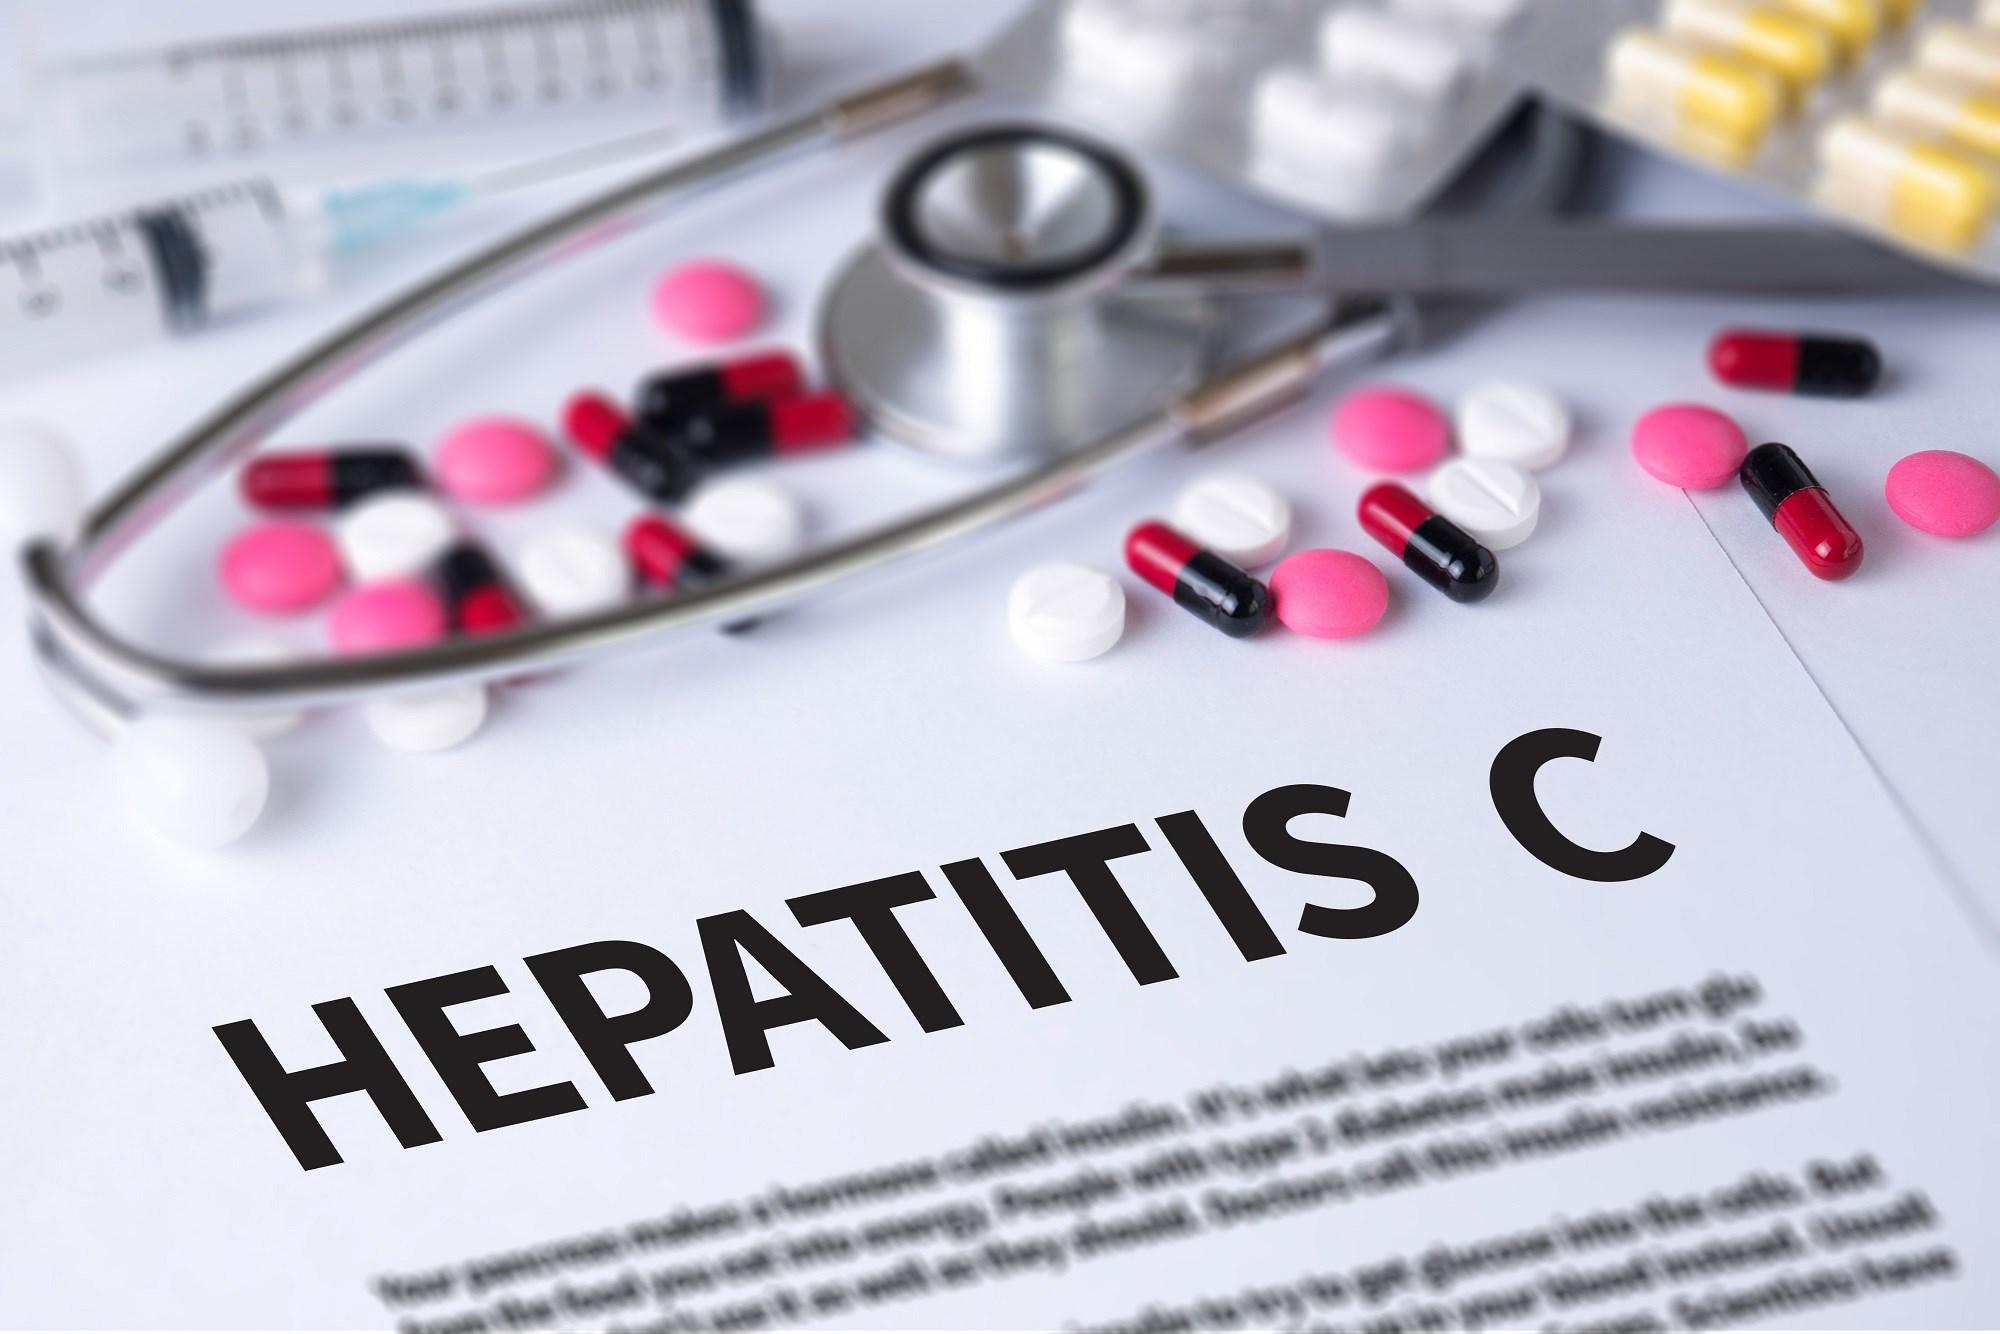 No serious adverse events were attributed to glecaprevir/pibrentasvir and study drug discontinuation was rare.